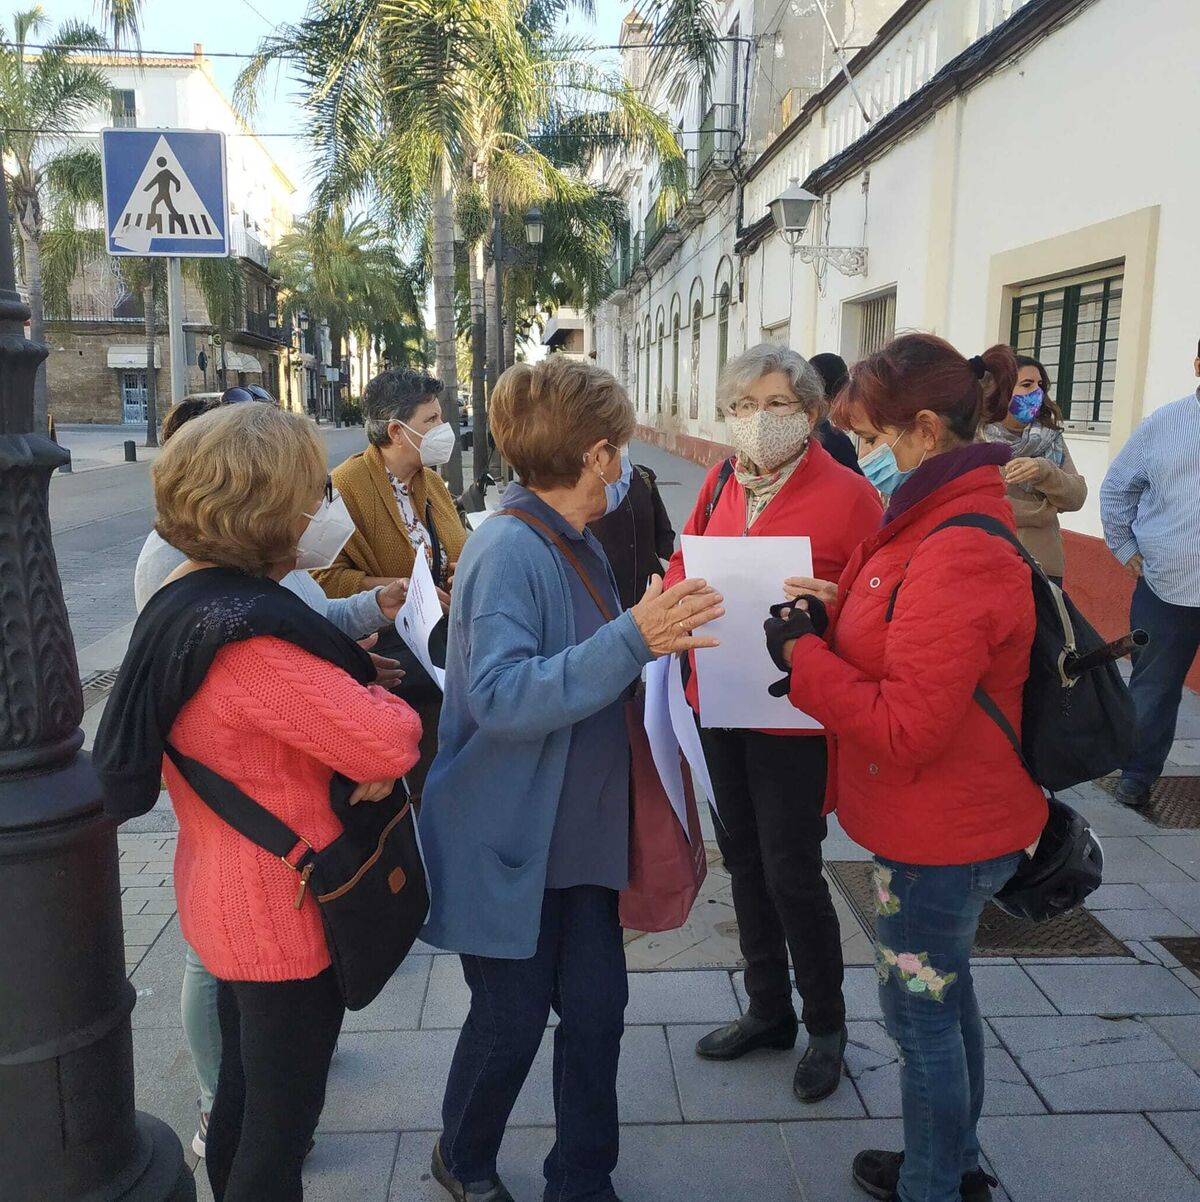 https://www.diariodecadiz.es/2020/11/20/noticias-provincia-cadiz/concentracion-carteles-Escuela-Infantil-Municipal_1521458194_128348963_1200x1203.jpg